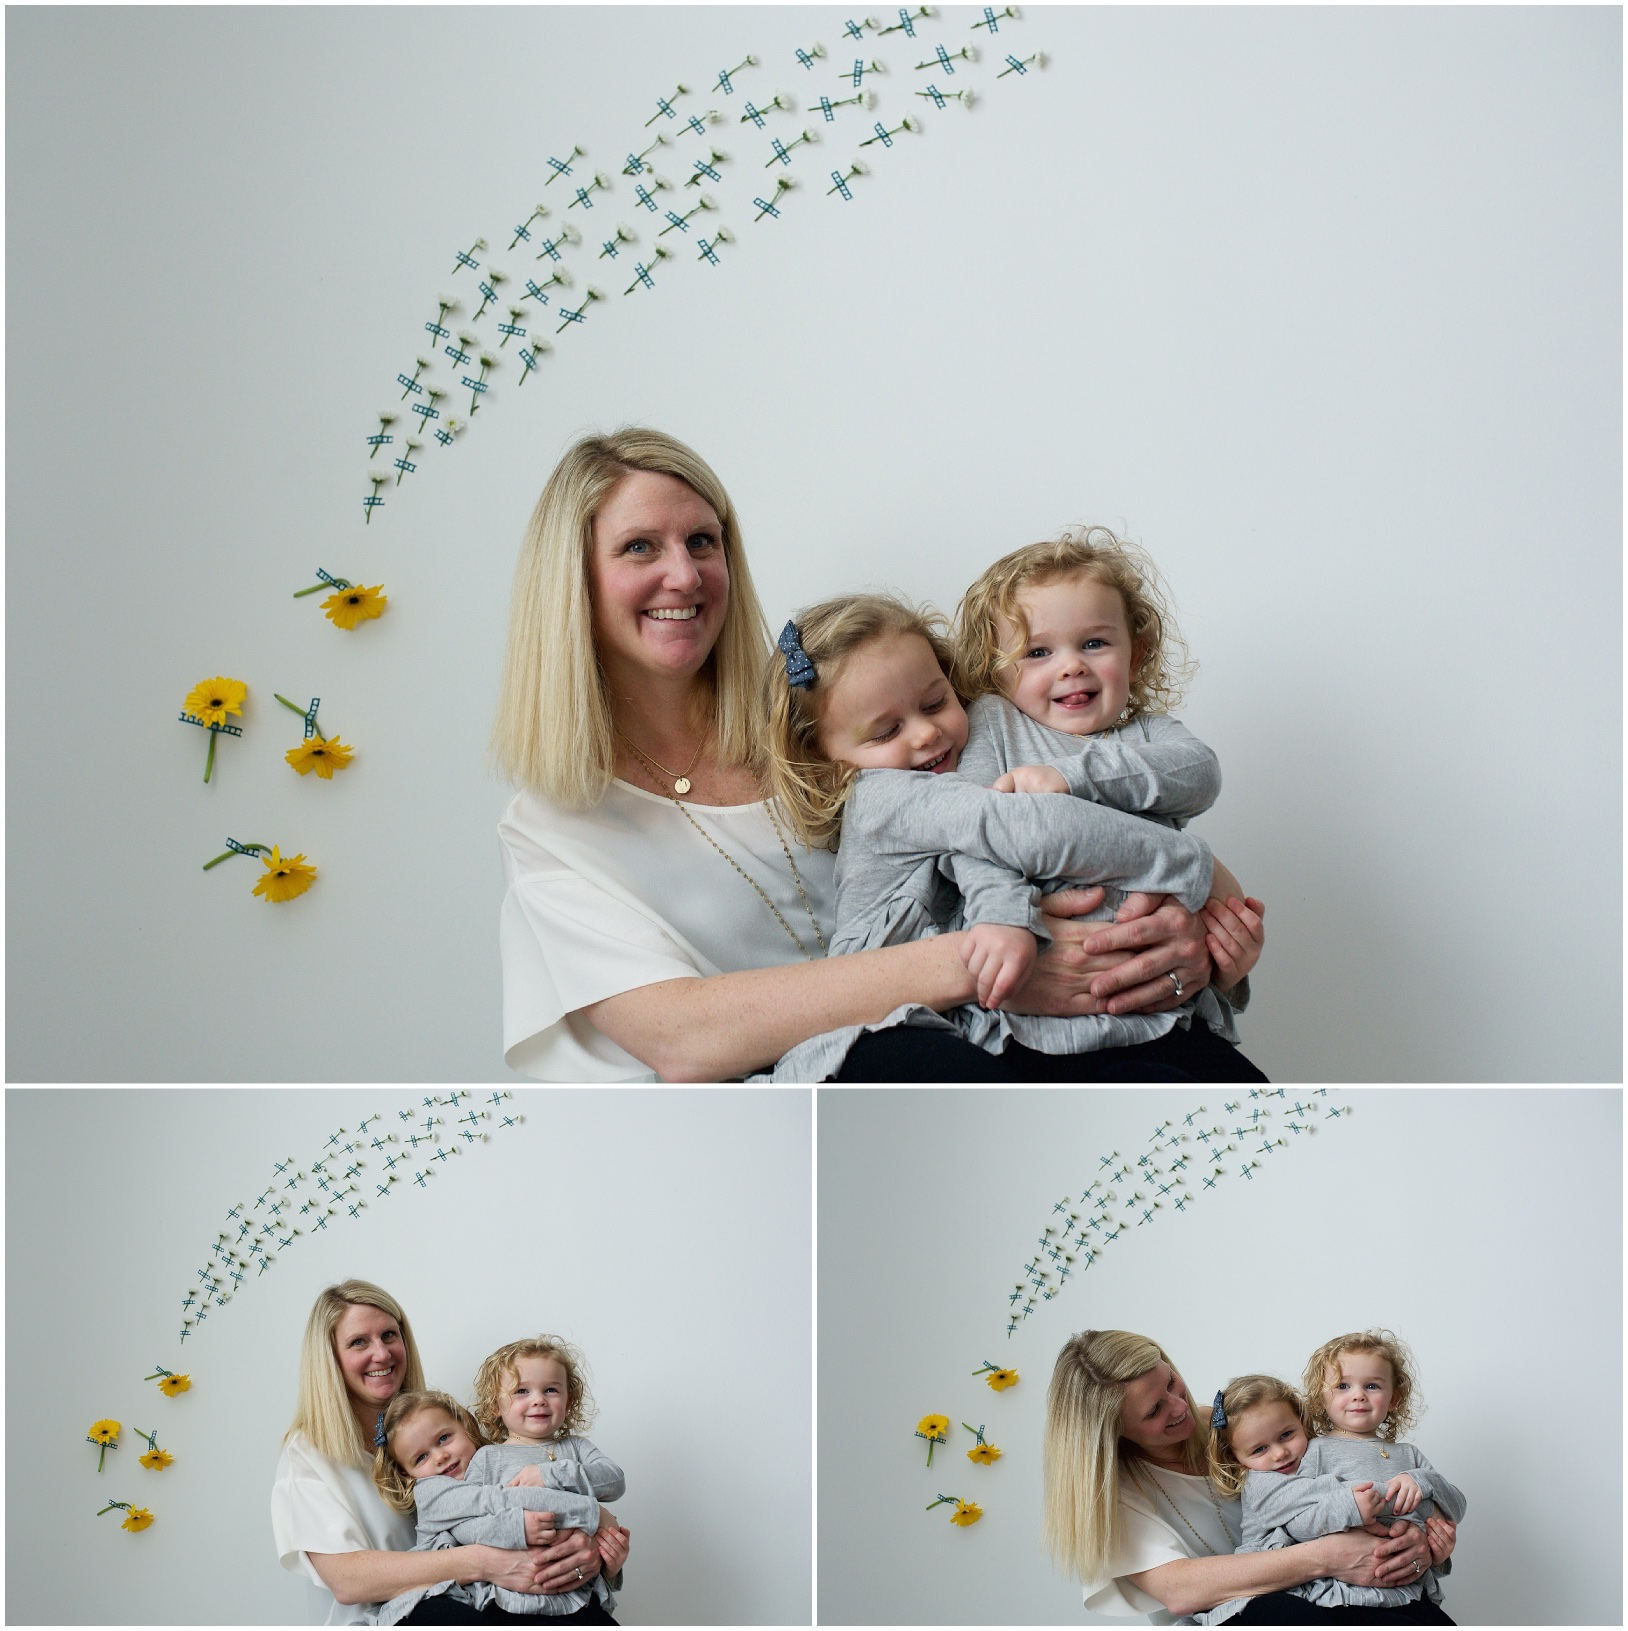 lindseyjane_family007.jpg